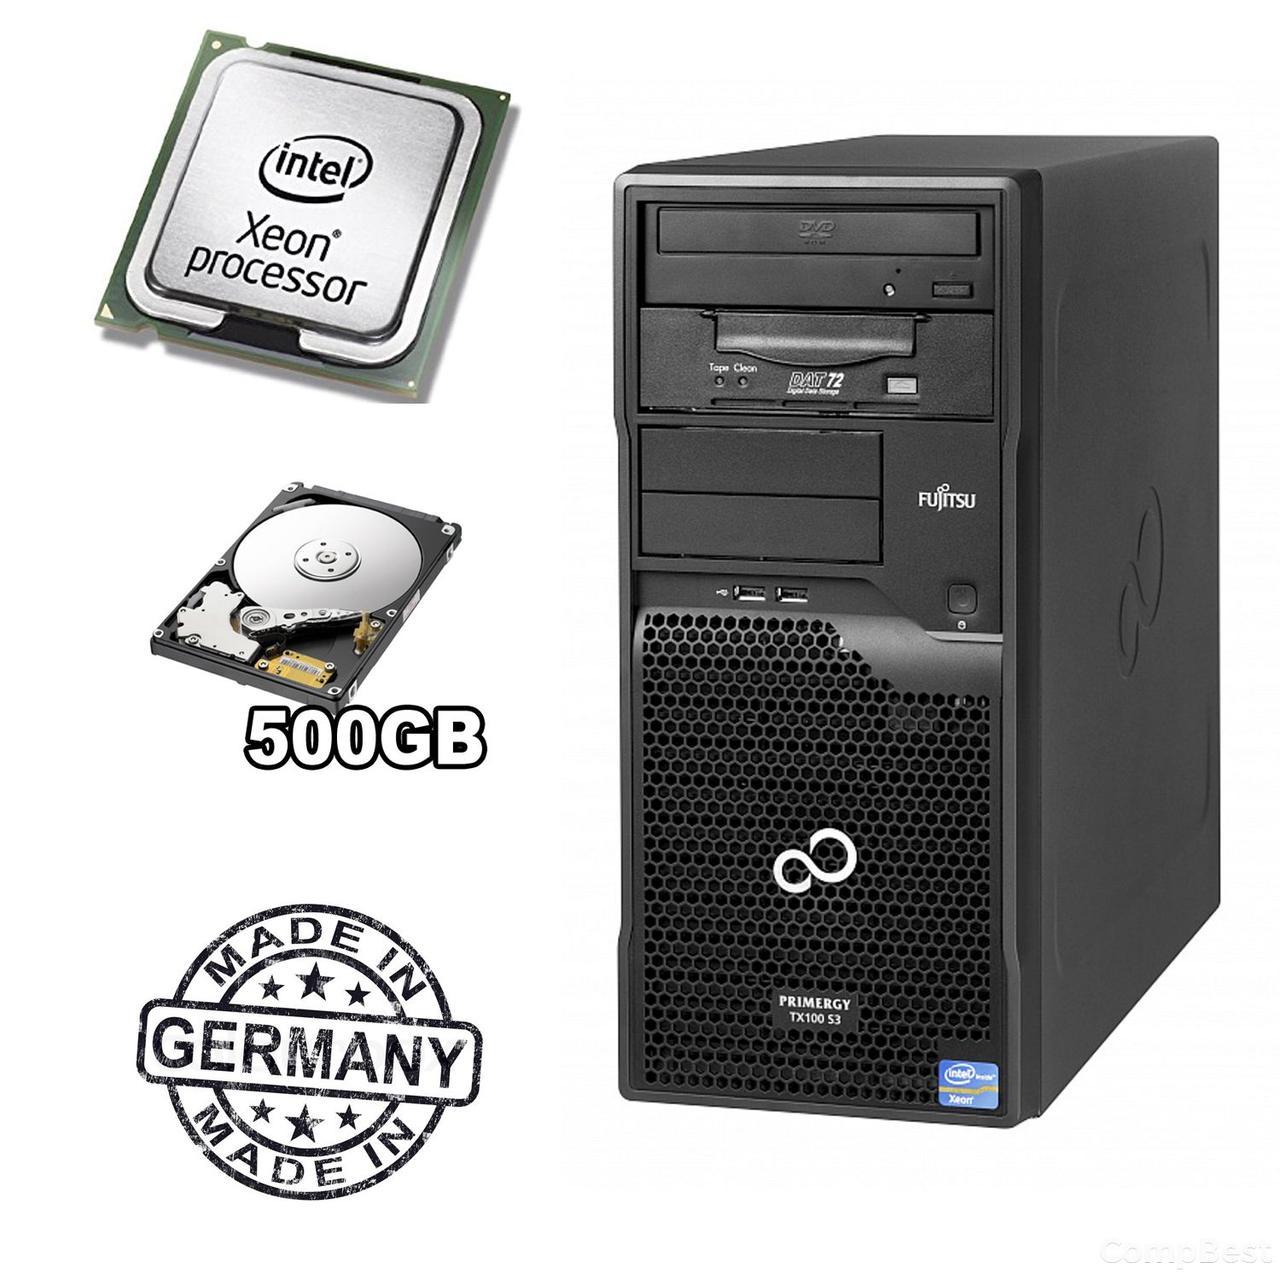 Сервер FUJITSU PRIMERGY TX100 S3p Tower Server / Intel® Xeon® E3-1220 (4 ядра по 3,1 - 3,4 GHz) / 8 GB DDR3 / 500 GB HDD